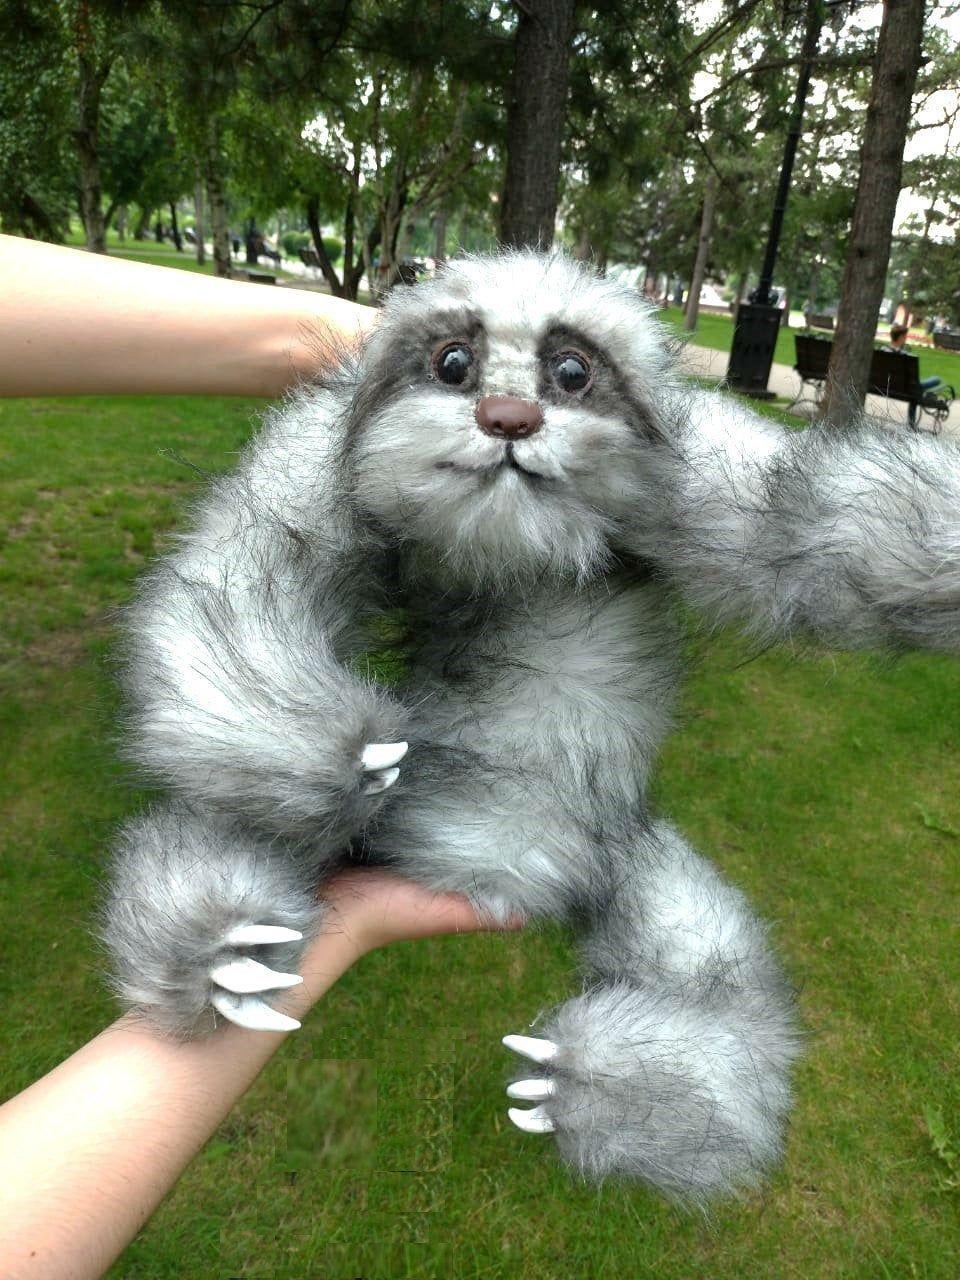 Realistic stuffed sloth. Realistic stuffed animal.Stuffed